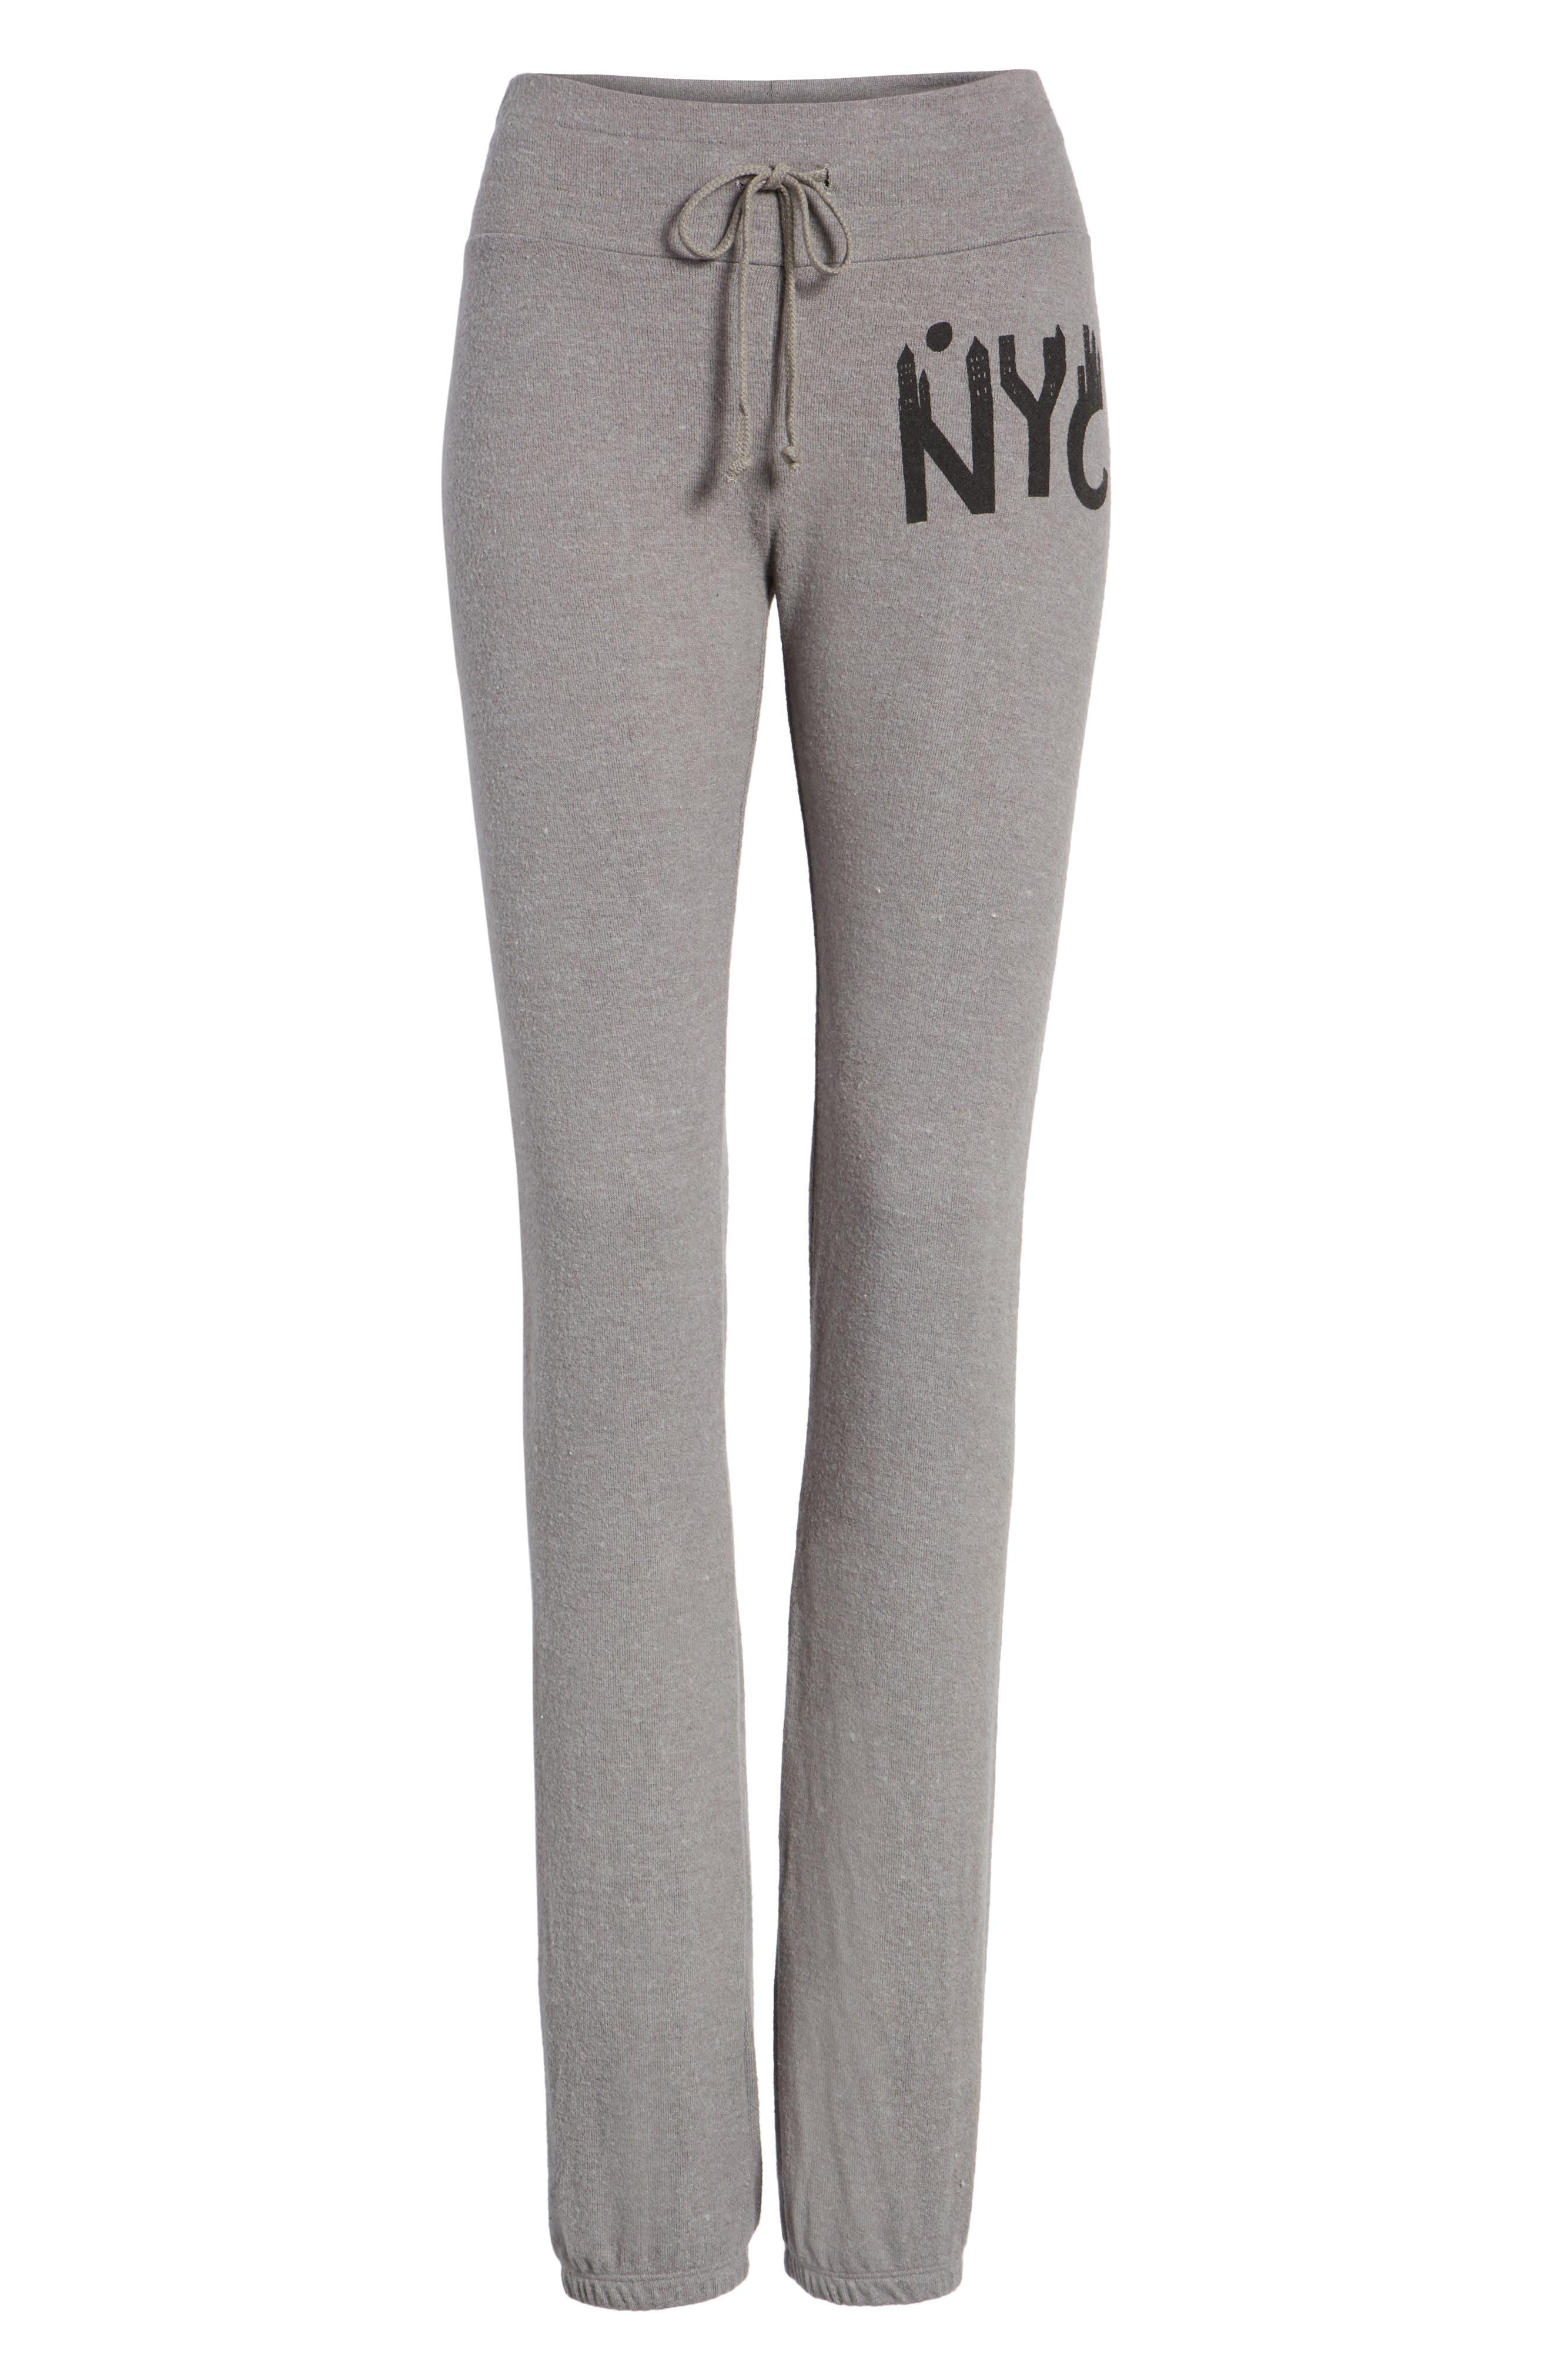 NYC Sweatpants,                             Alternate thumbnail 6, color,                             Vintage Grey